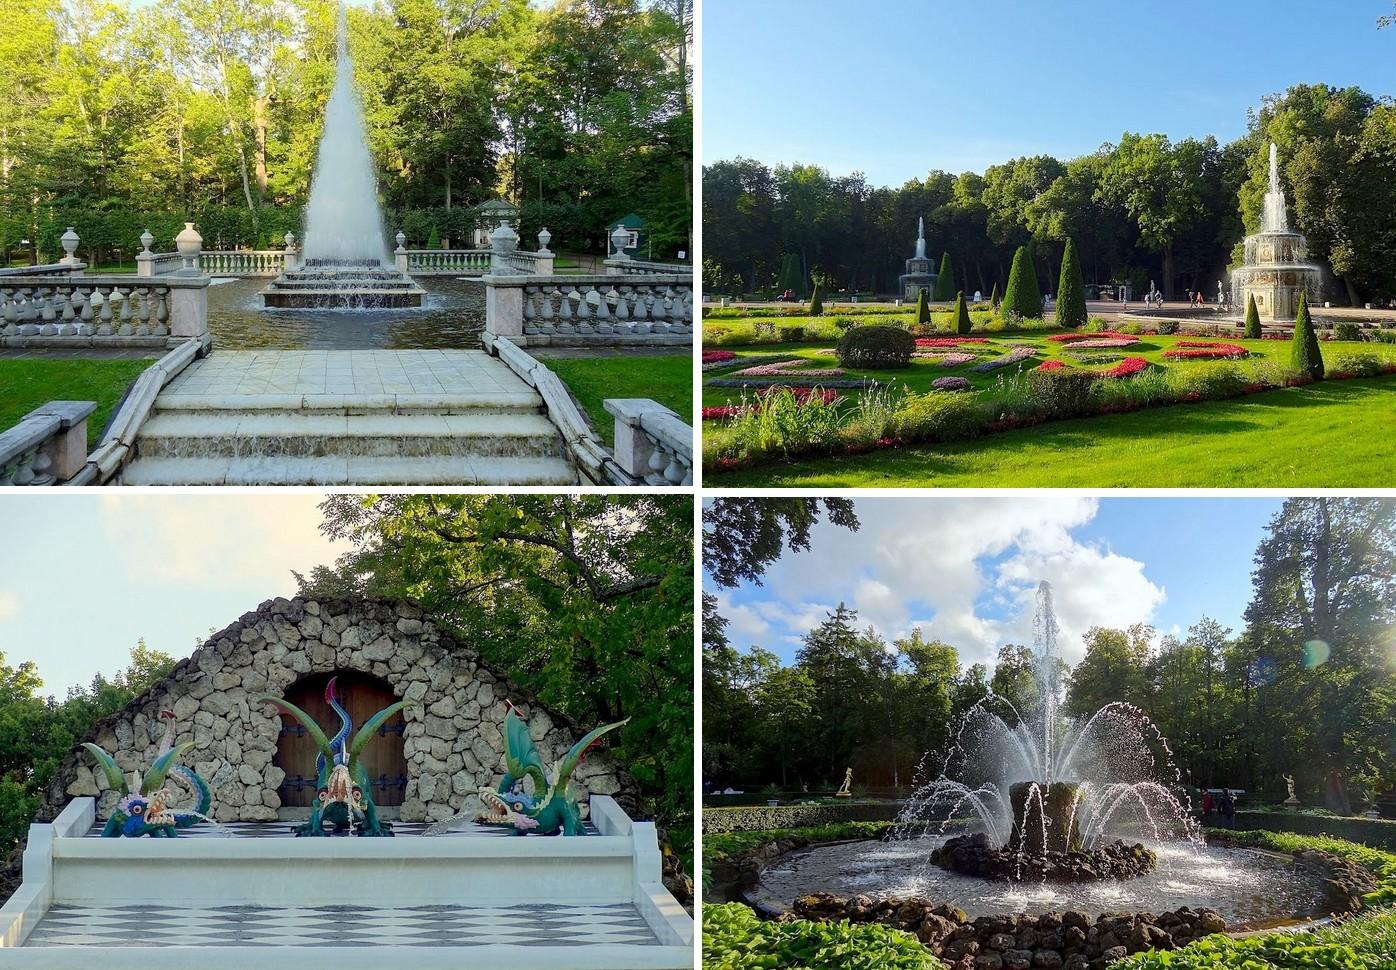 visiter-palais-peterhof-saint-petersbourg-inferieur